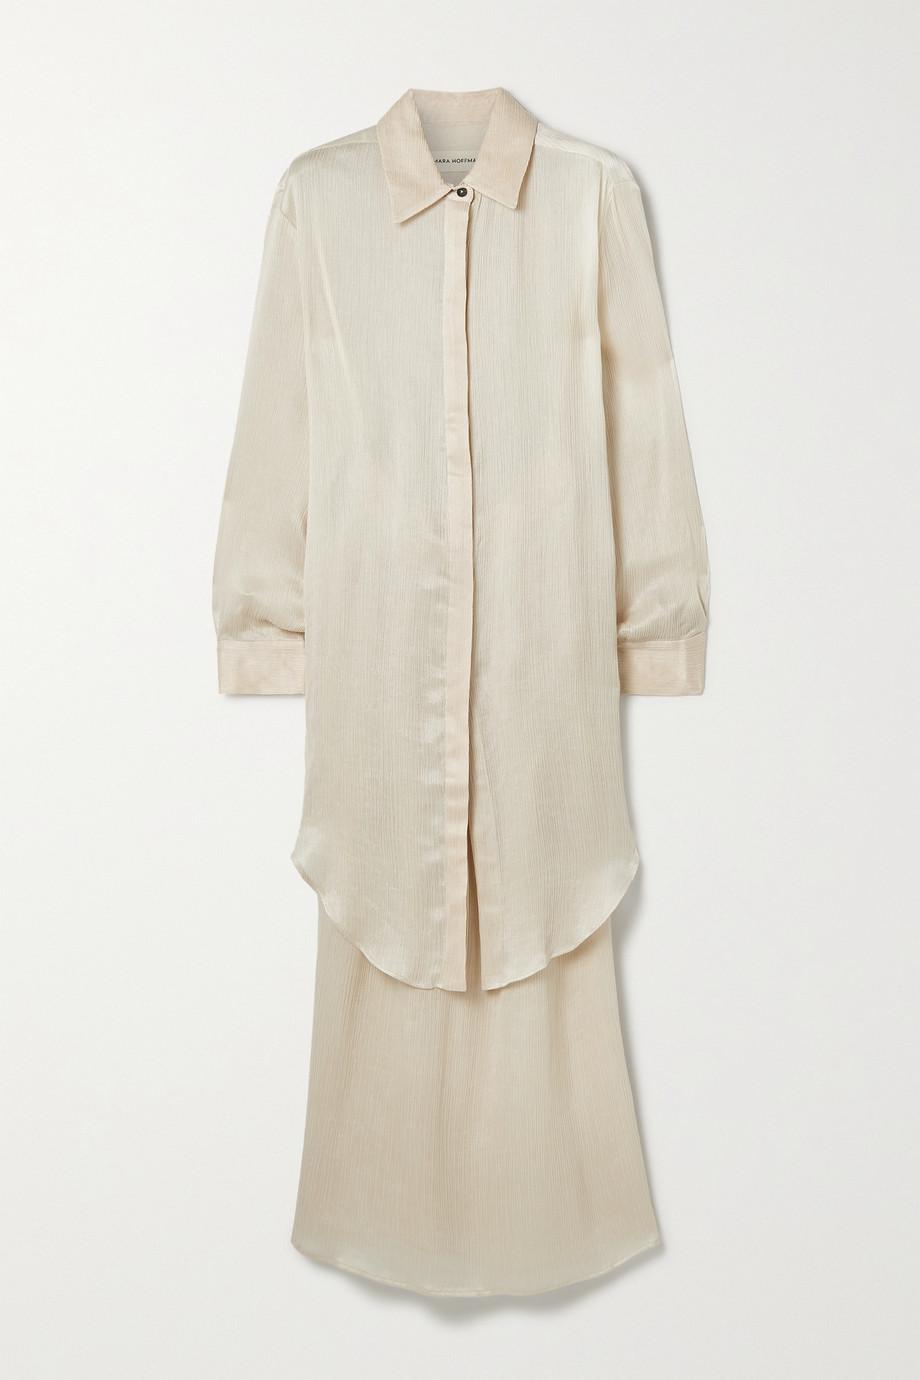 Mara Hoffman Agata 细褶天丝长丝顺纡绉衬衫半身裙套装